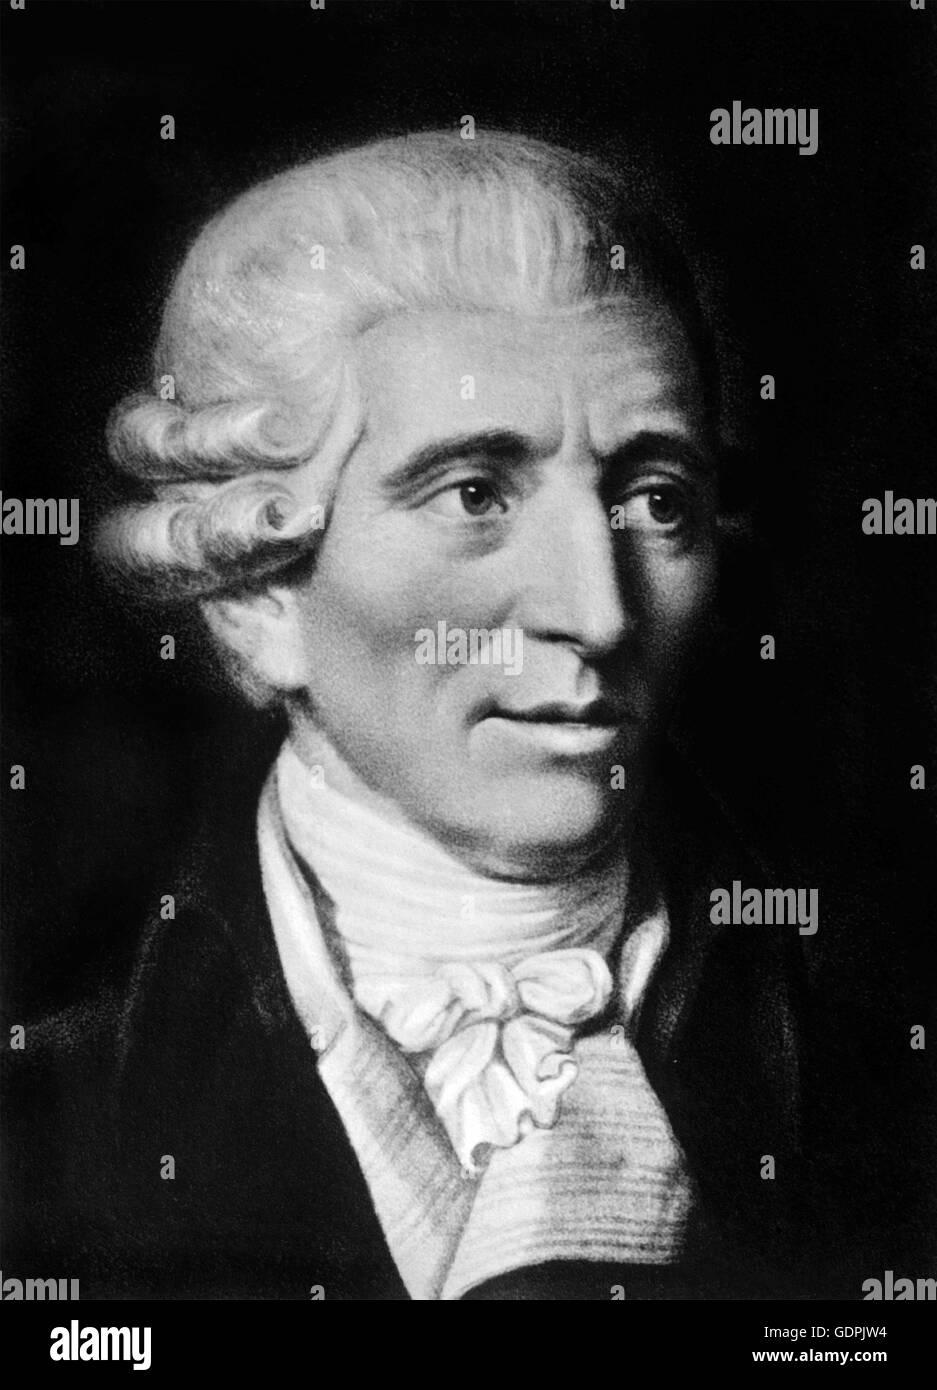 Joseph Haydn. Portrait of the Austrian composer, (Franz) Joseph Haydn (1732-1809). - Stock Image